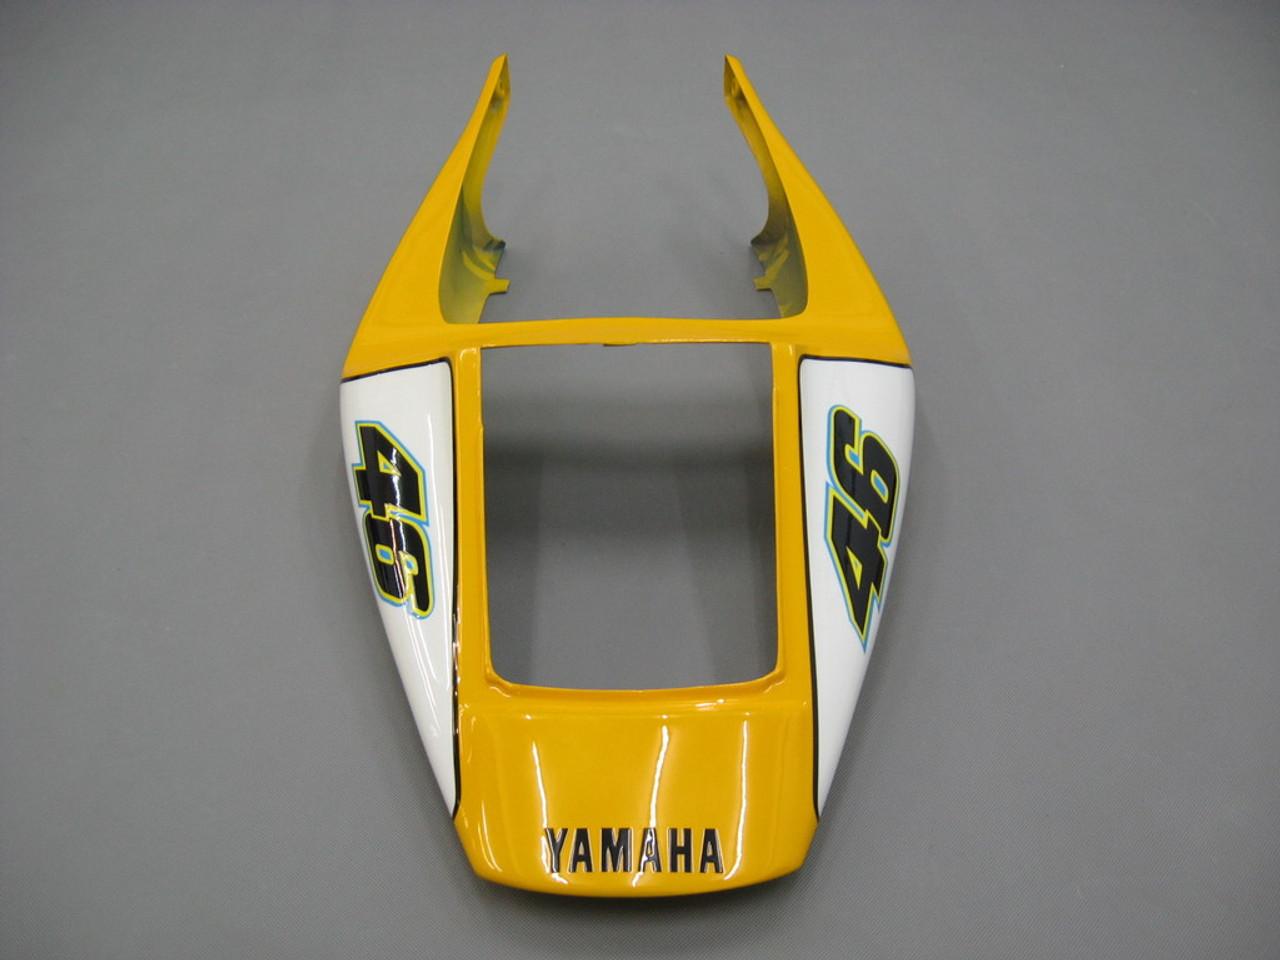 Fairings Yamaha YZF-R1 Yellow Blue No.46 Camel Racing (1998-1999)